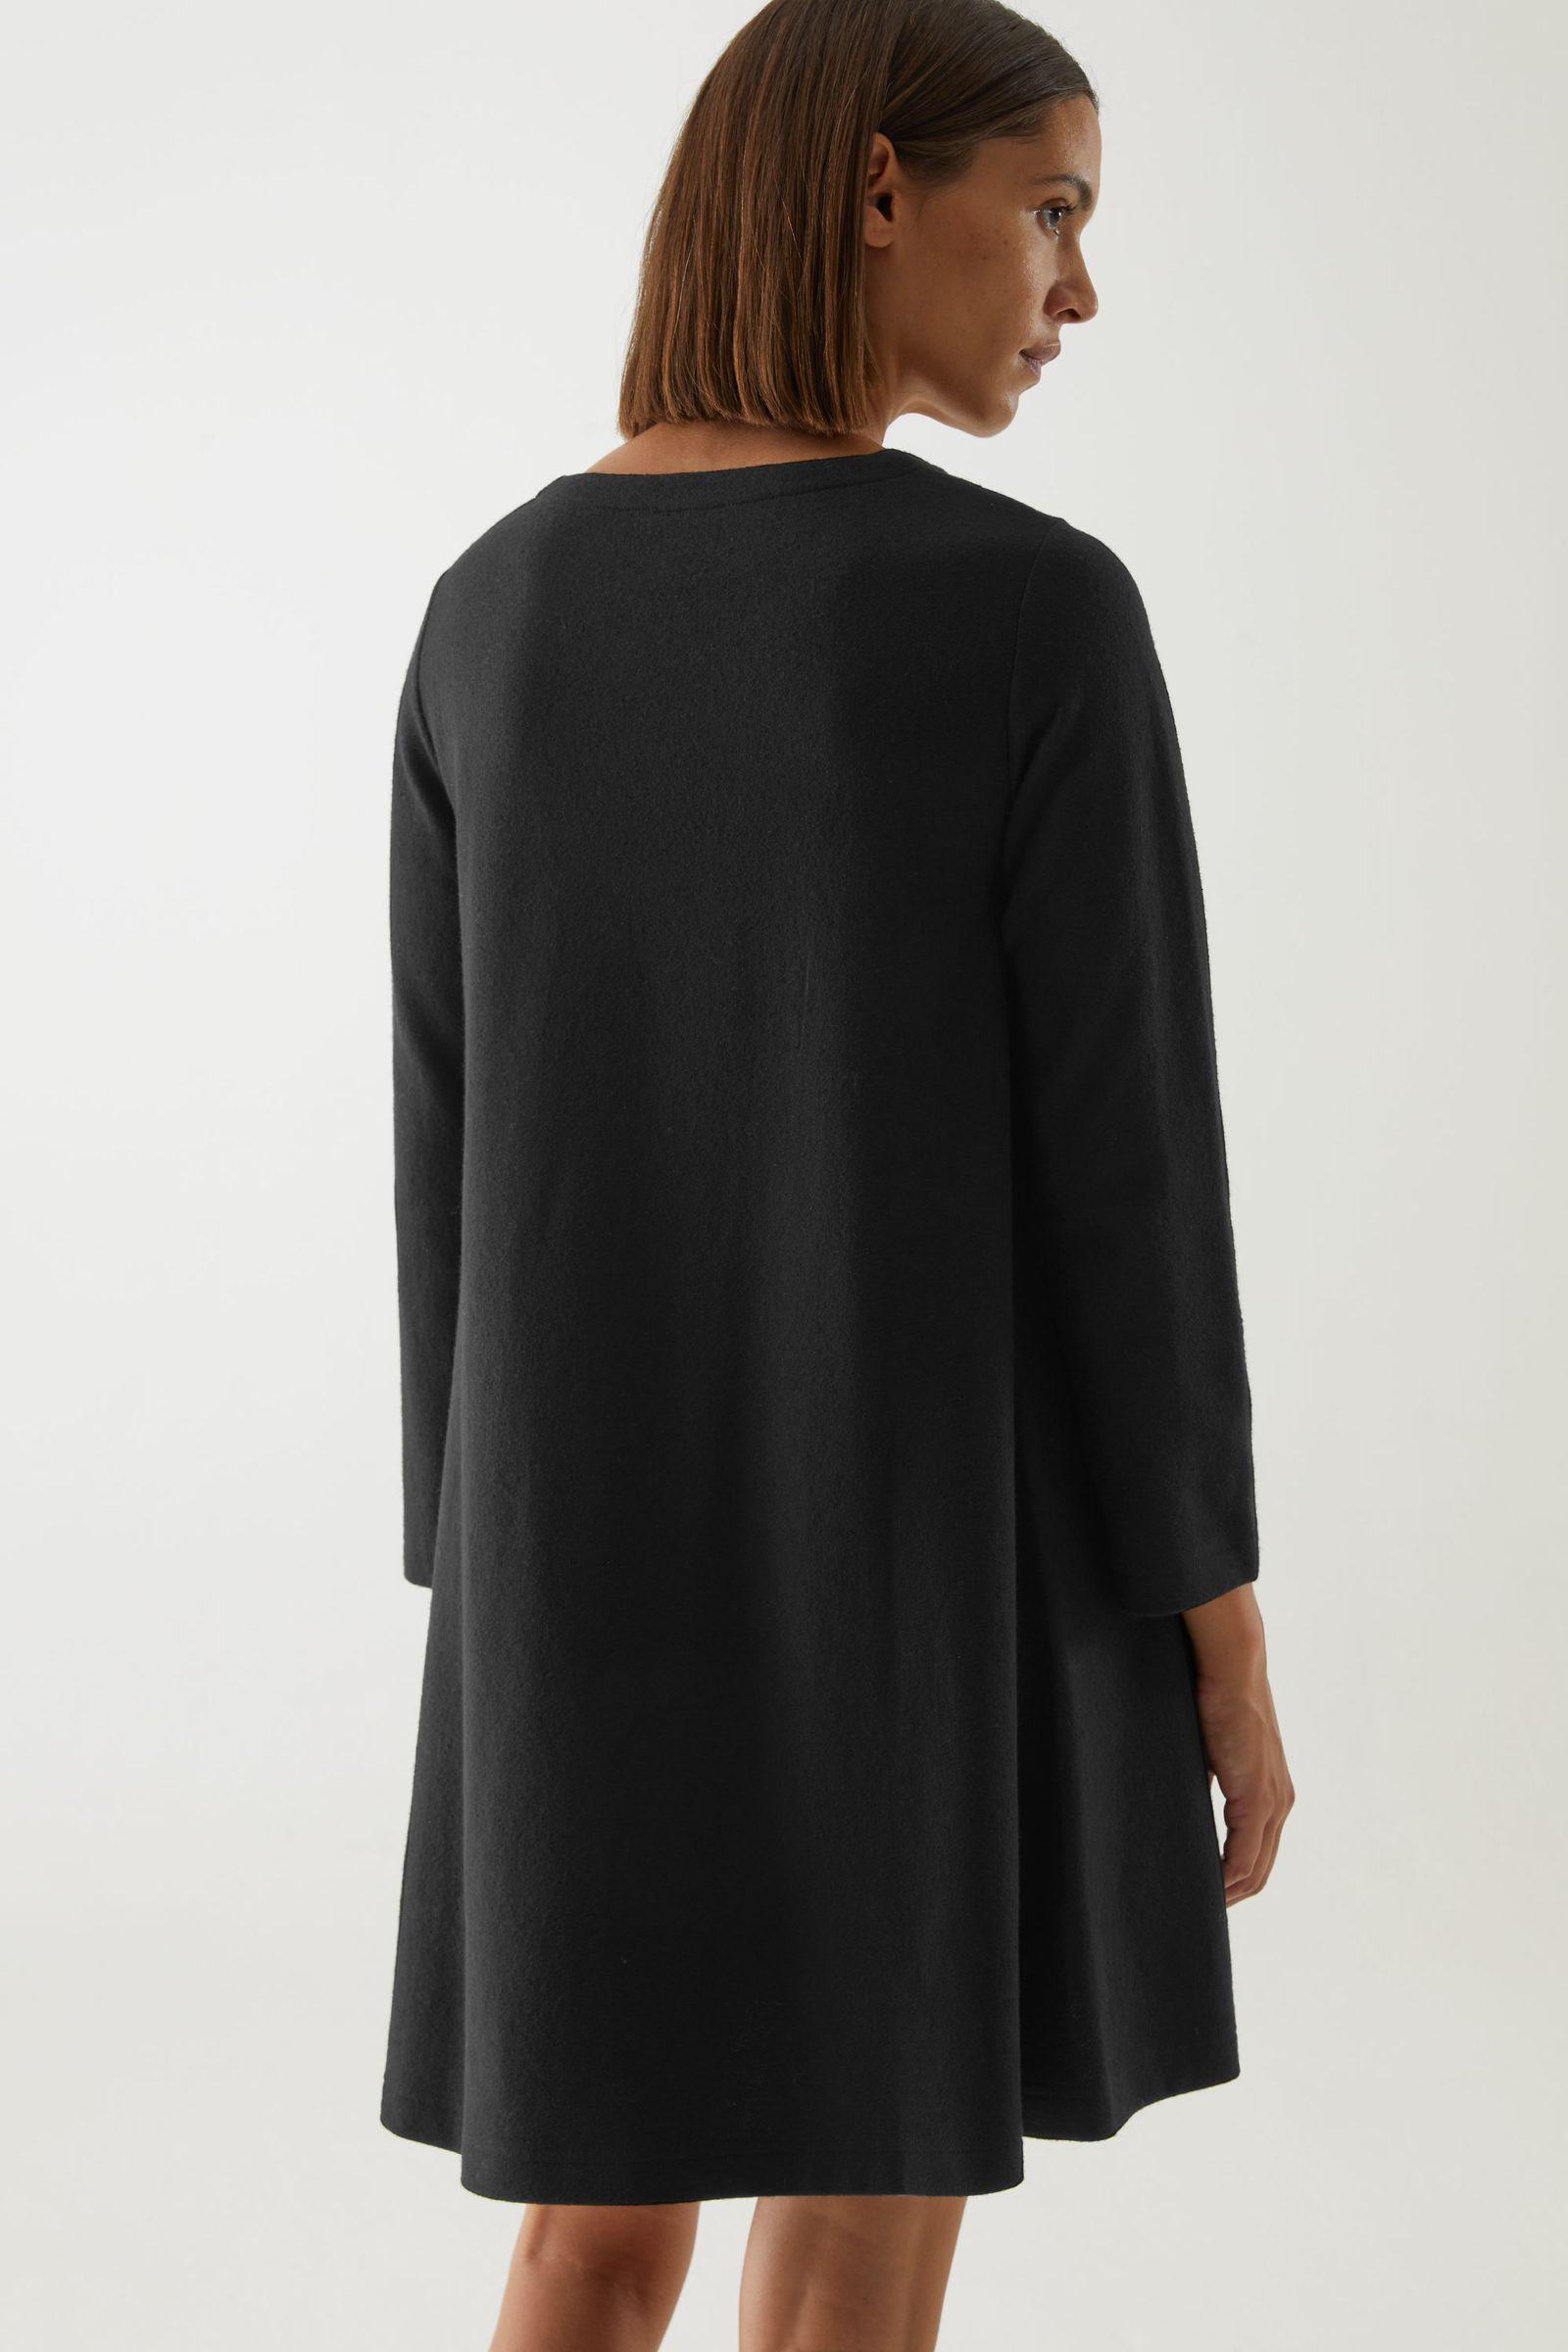 COS 메리노 울 오가닉 코튼 믹스 A라인 드레스의 블랙컬러 ECOMLook입니다.